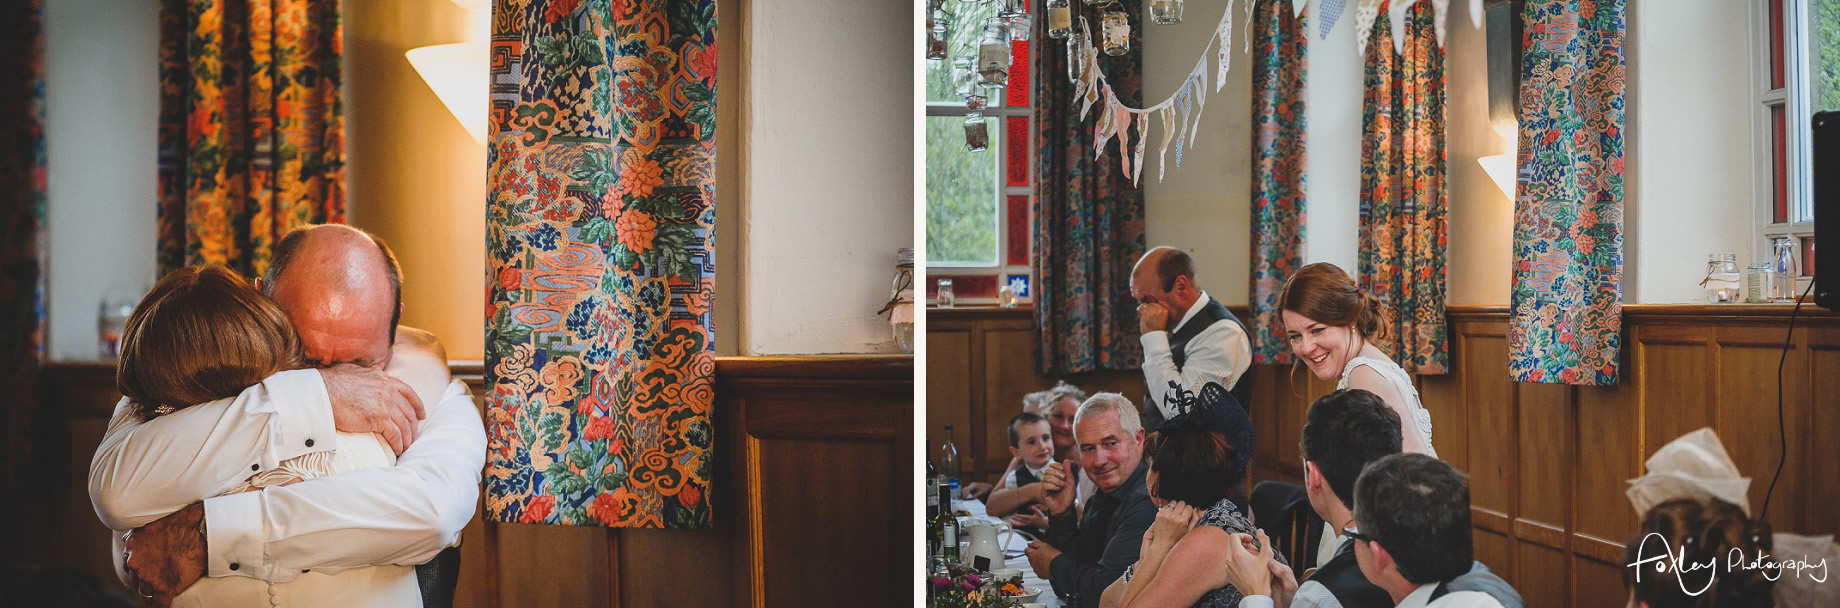 Mel-and-Lewis-Wedding-at-Barley-Village-Hall-145